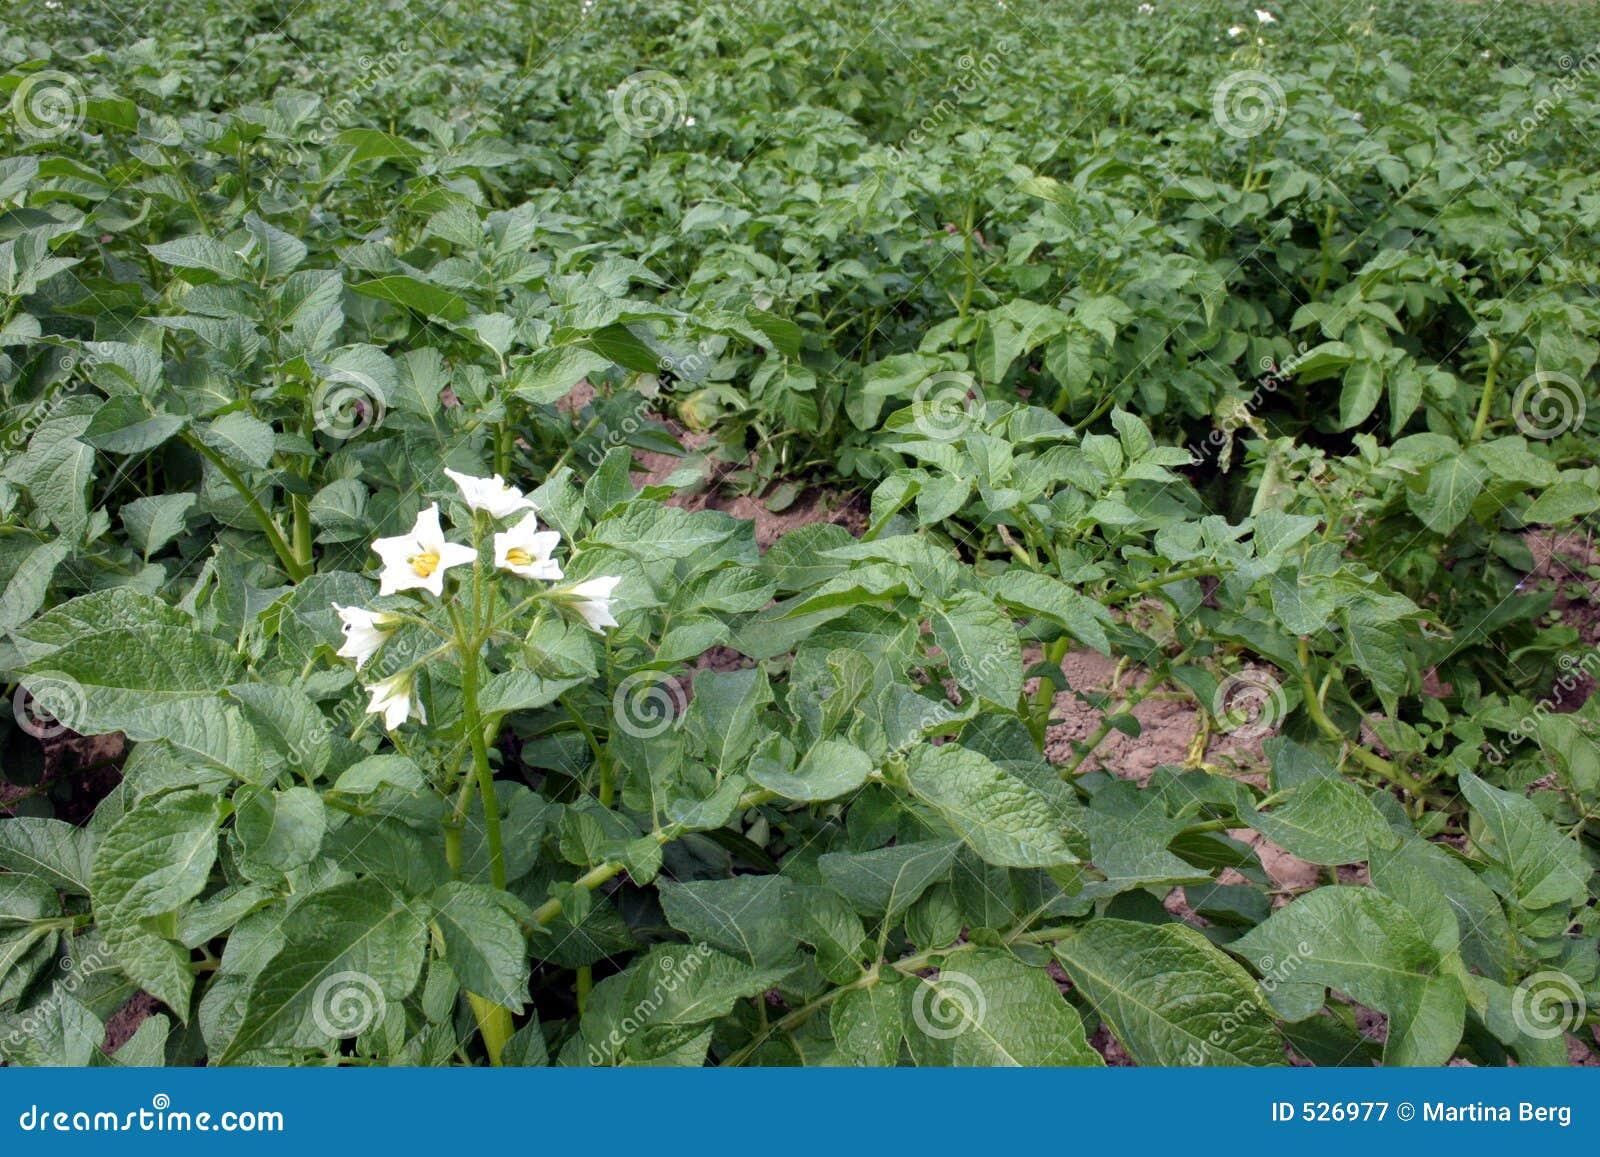 Download 域土豆 库存图片. 图片 包括有 地球, 食物, 种田, 农场, 土豆, 有用, 推车, 耕种, 问题的, 绽放 - 526977